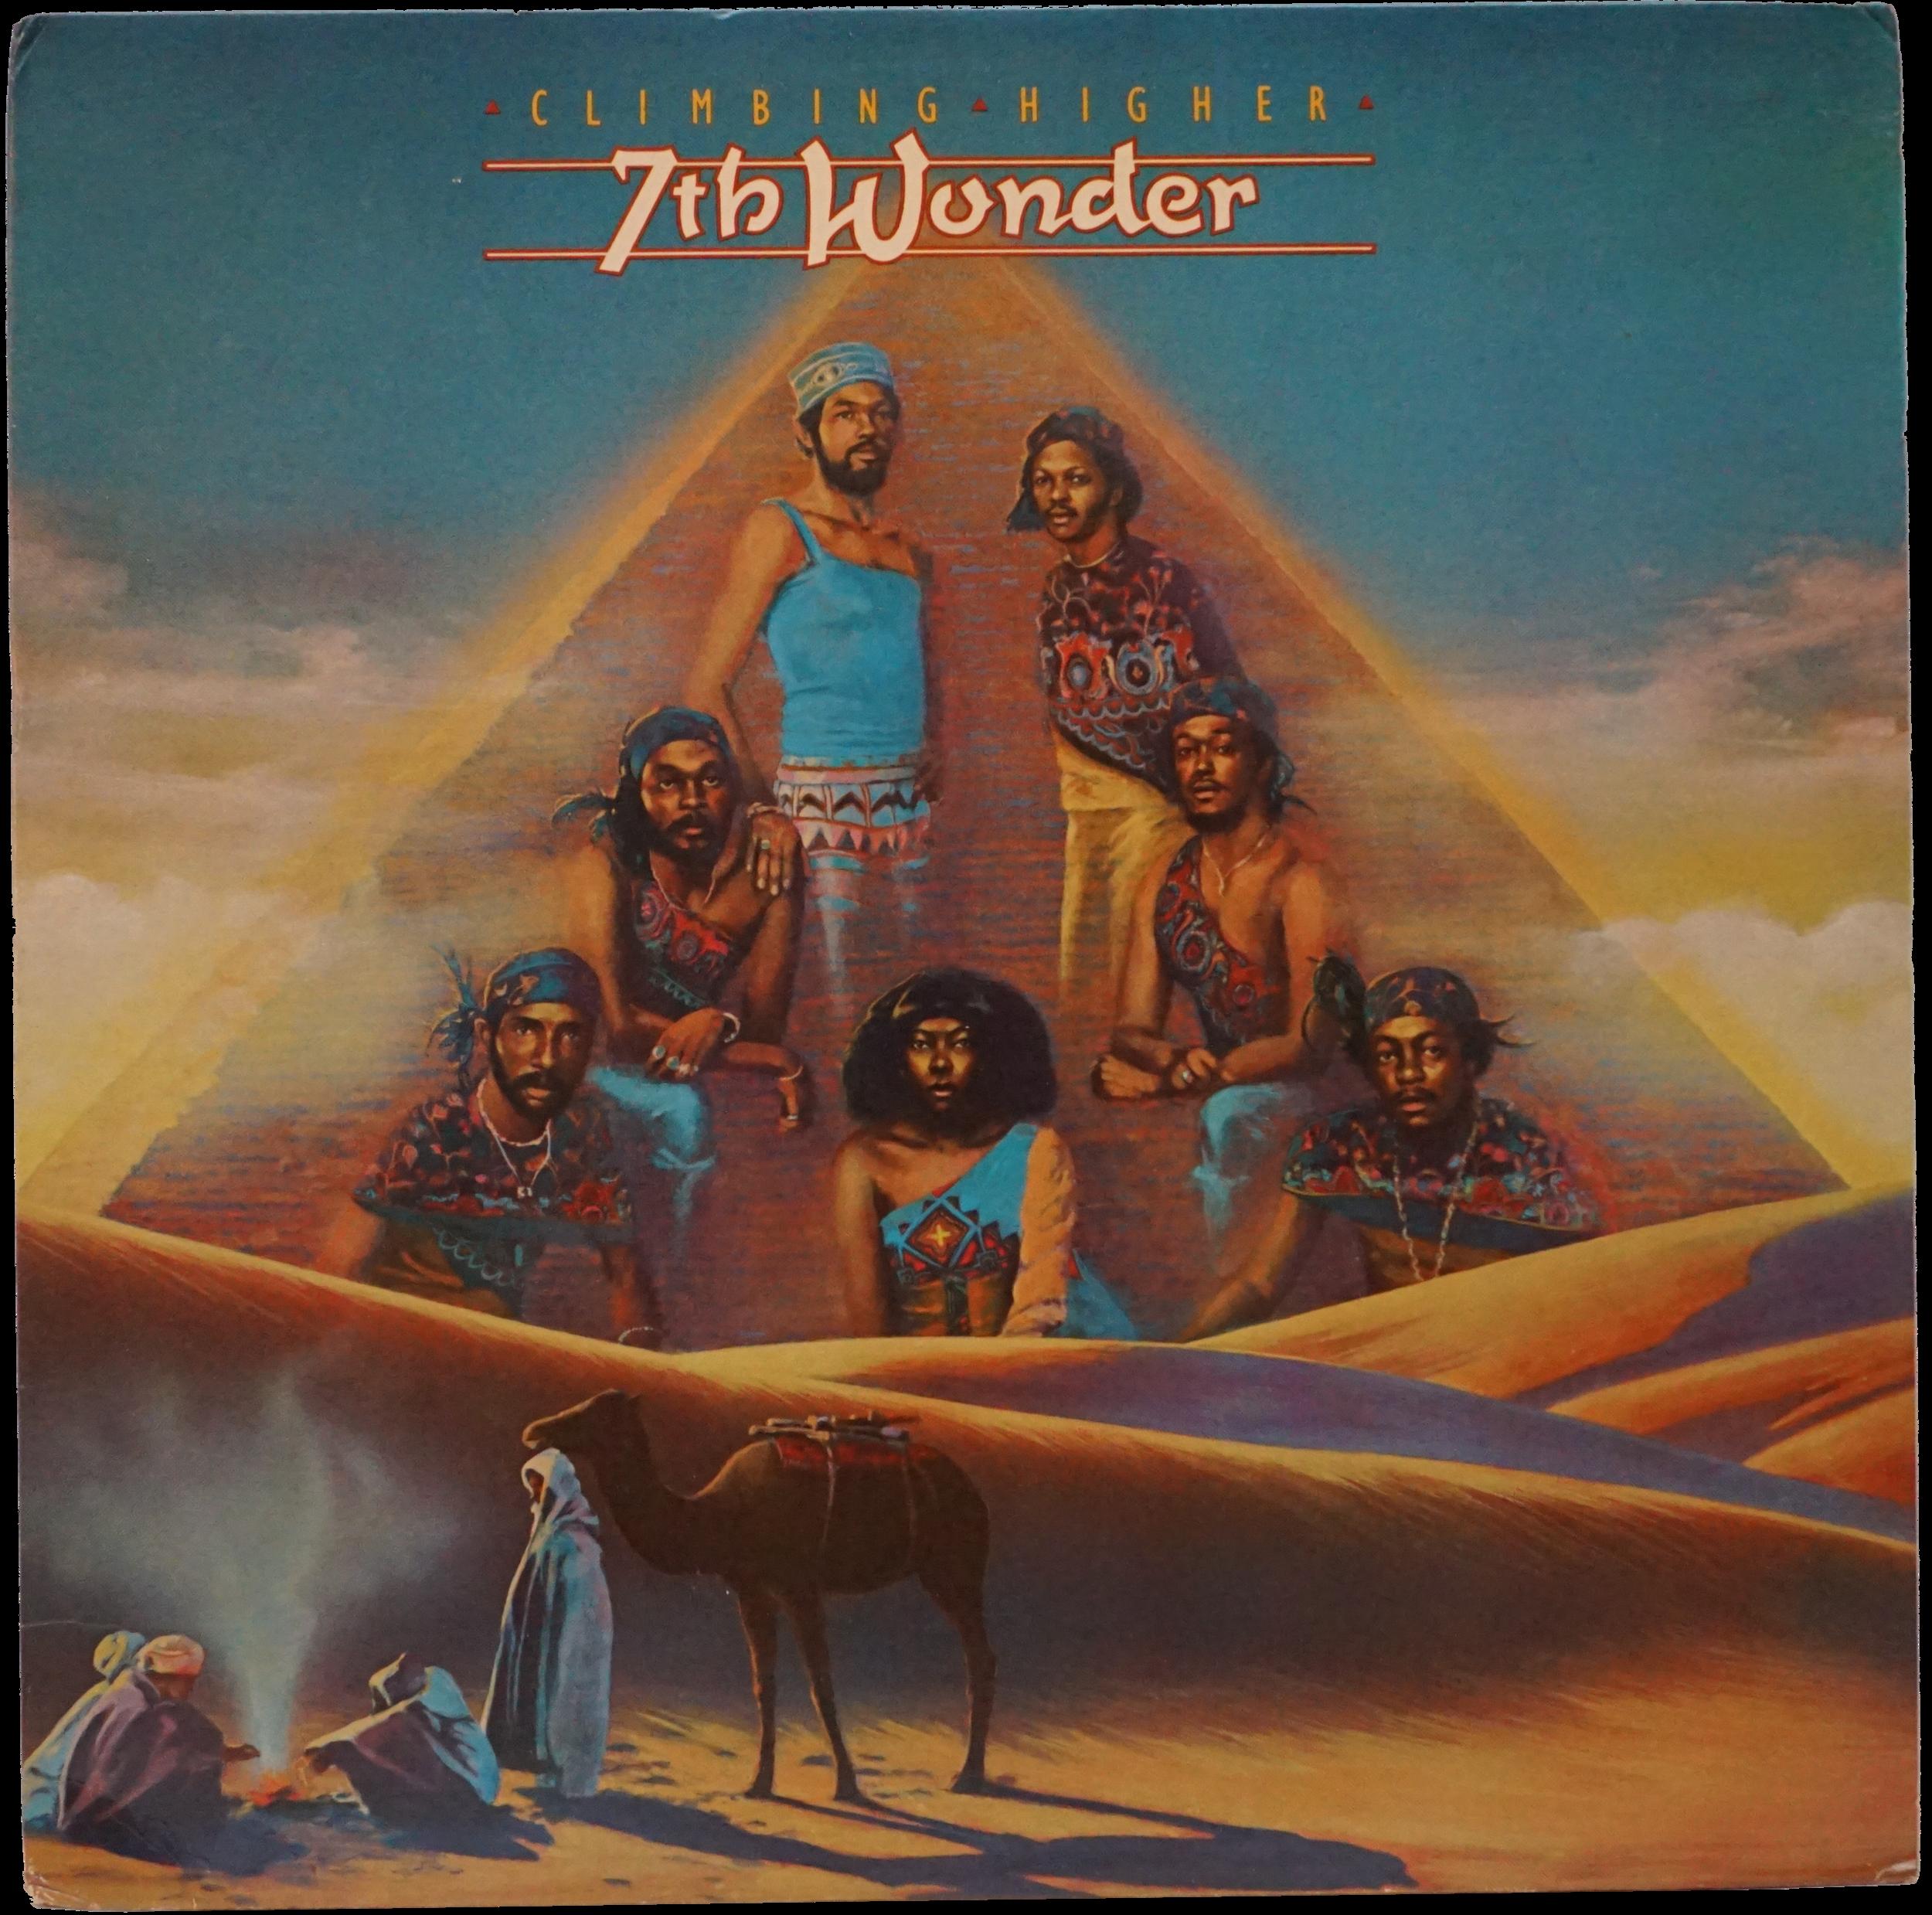 WLWLTDOO-1979-LP-7TH_WONDER-CLIMBLING_HIGHER-FRONT-RRLP014DJ.png